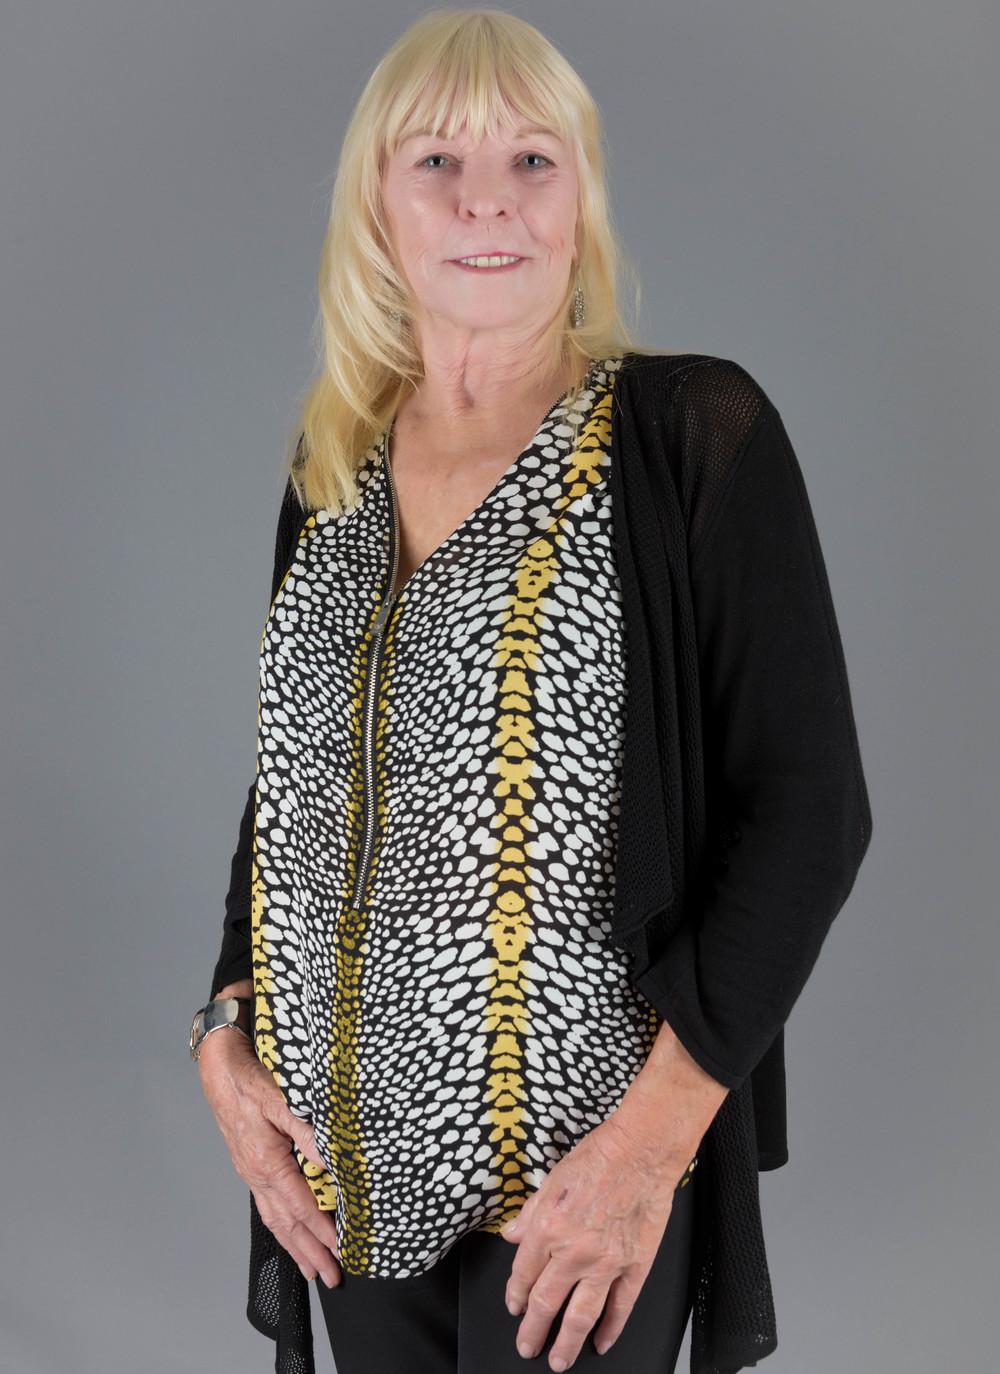 grandma studio portrait